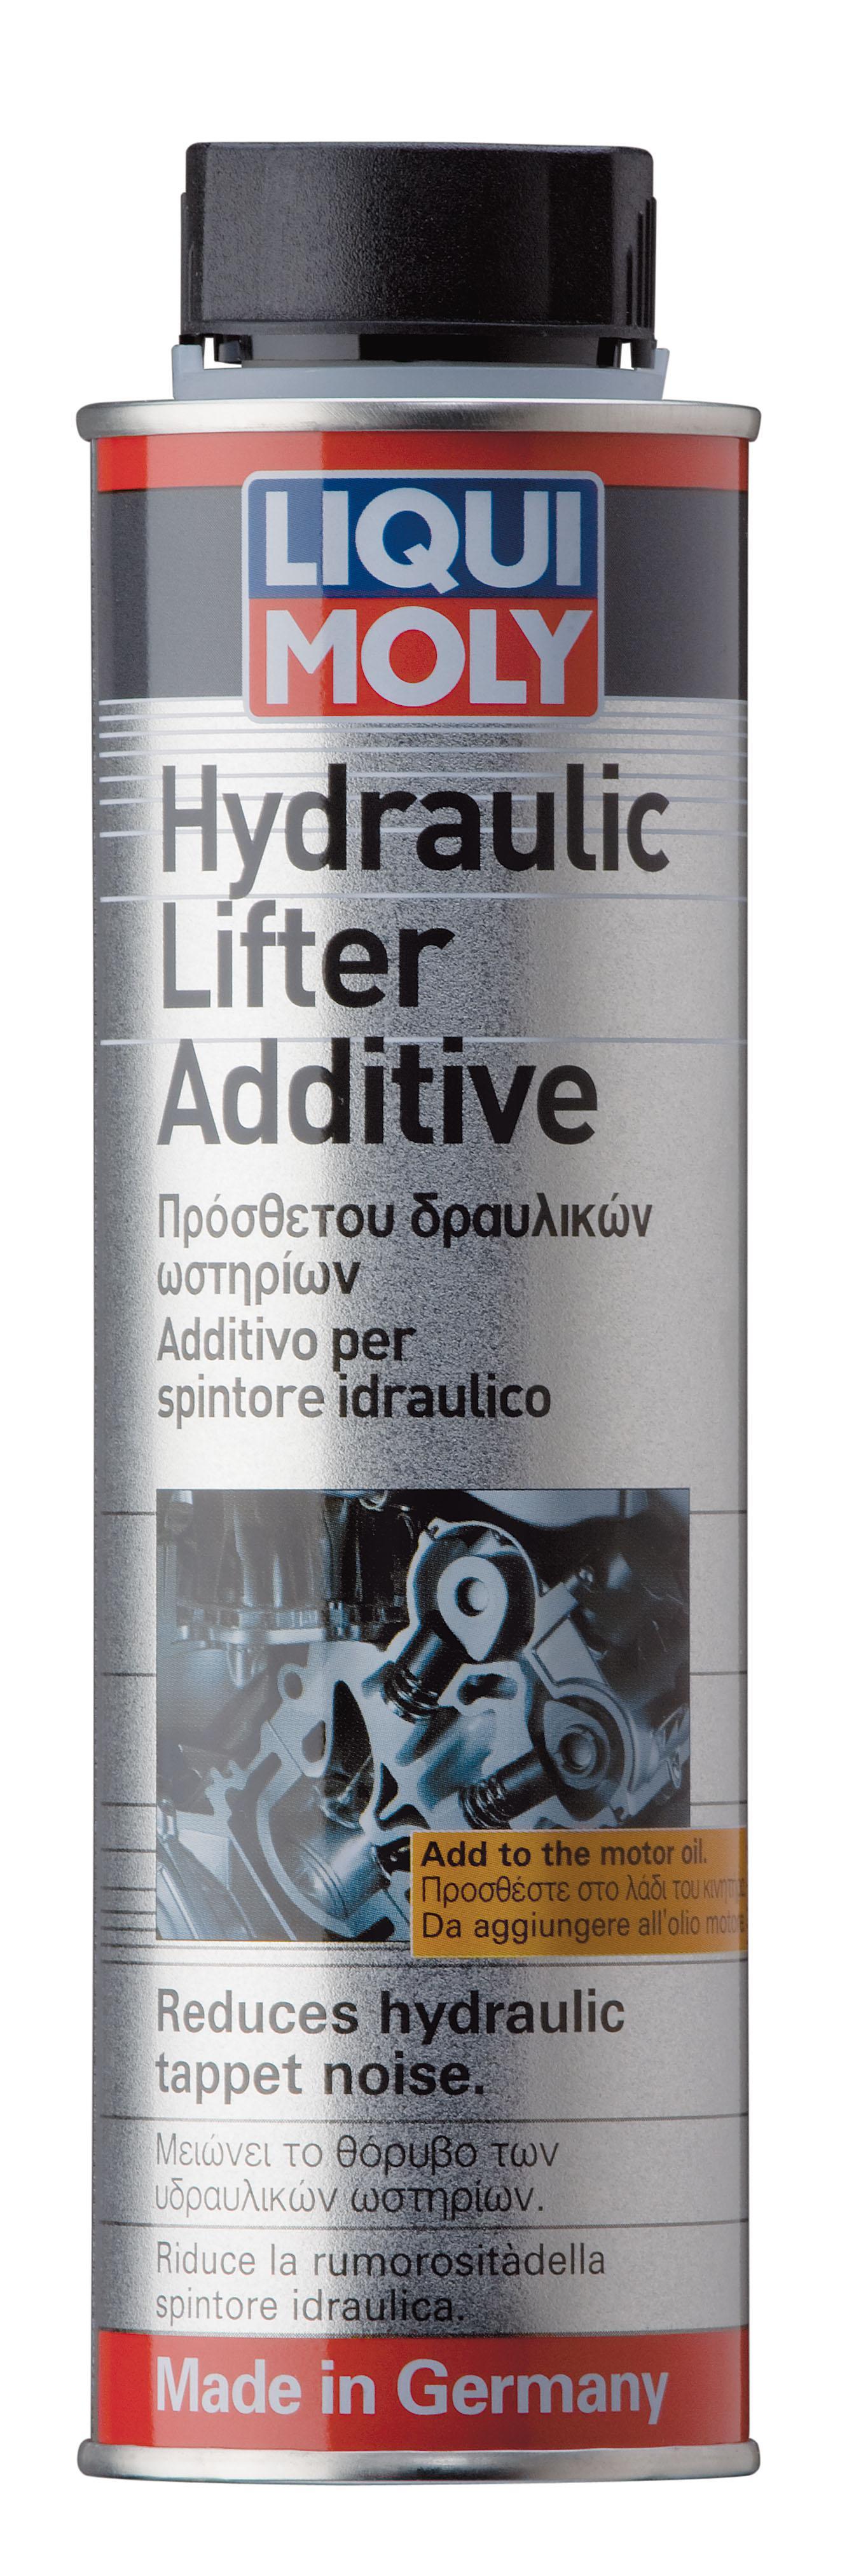 Liqui Moly 2770 Hydraulic Lifter Additive 300 ml Additivo Punterie Idrauliche